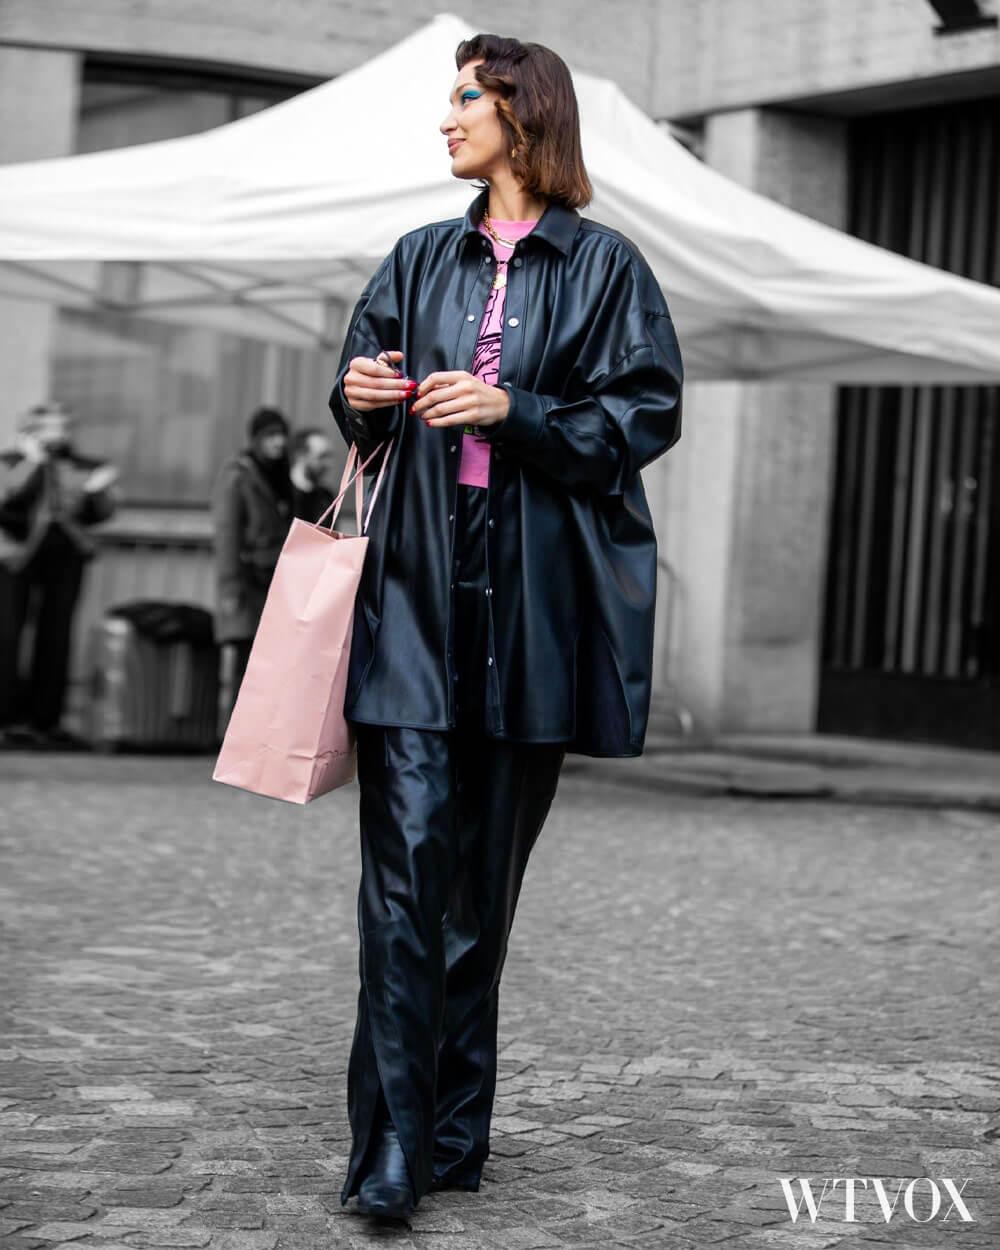 Bella Hadid wearing Rihanna's FENTY vegan leather outfit